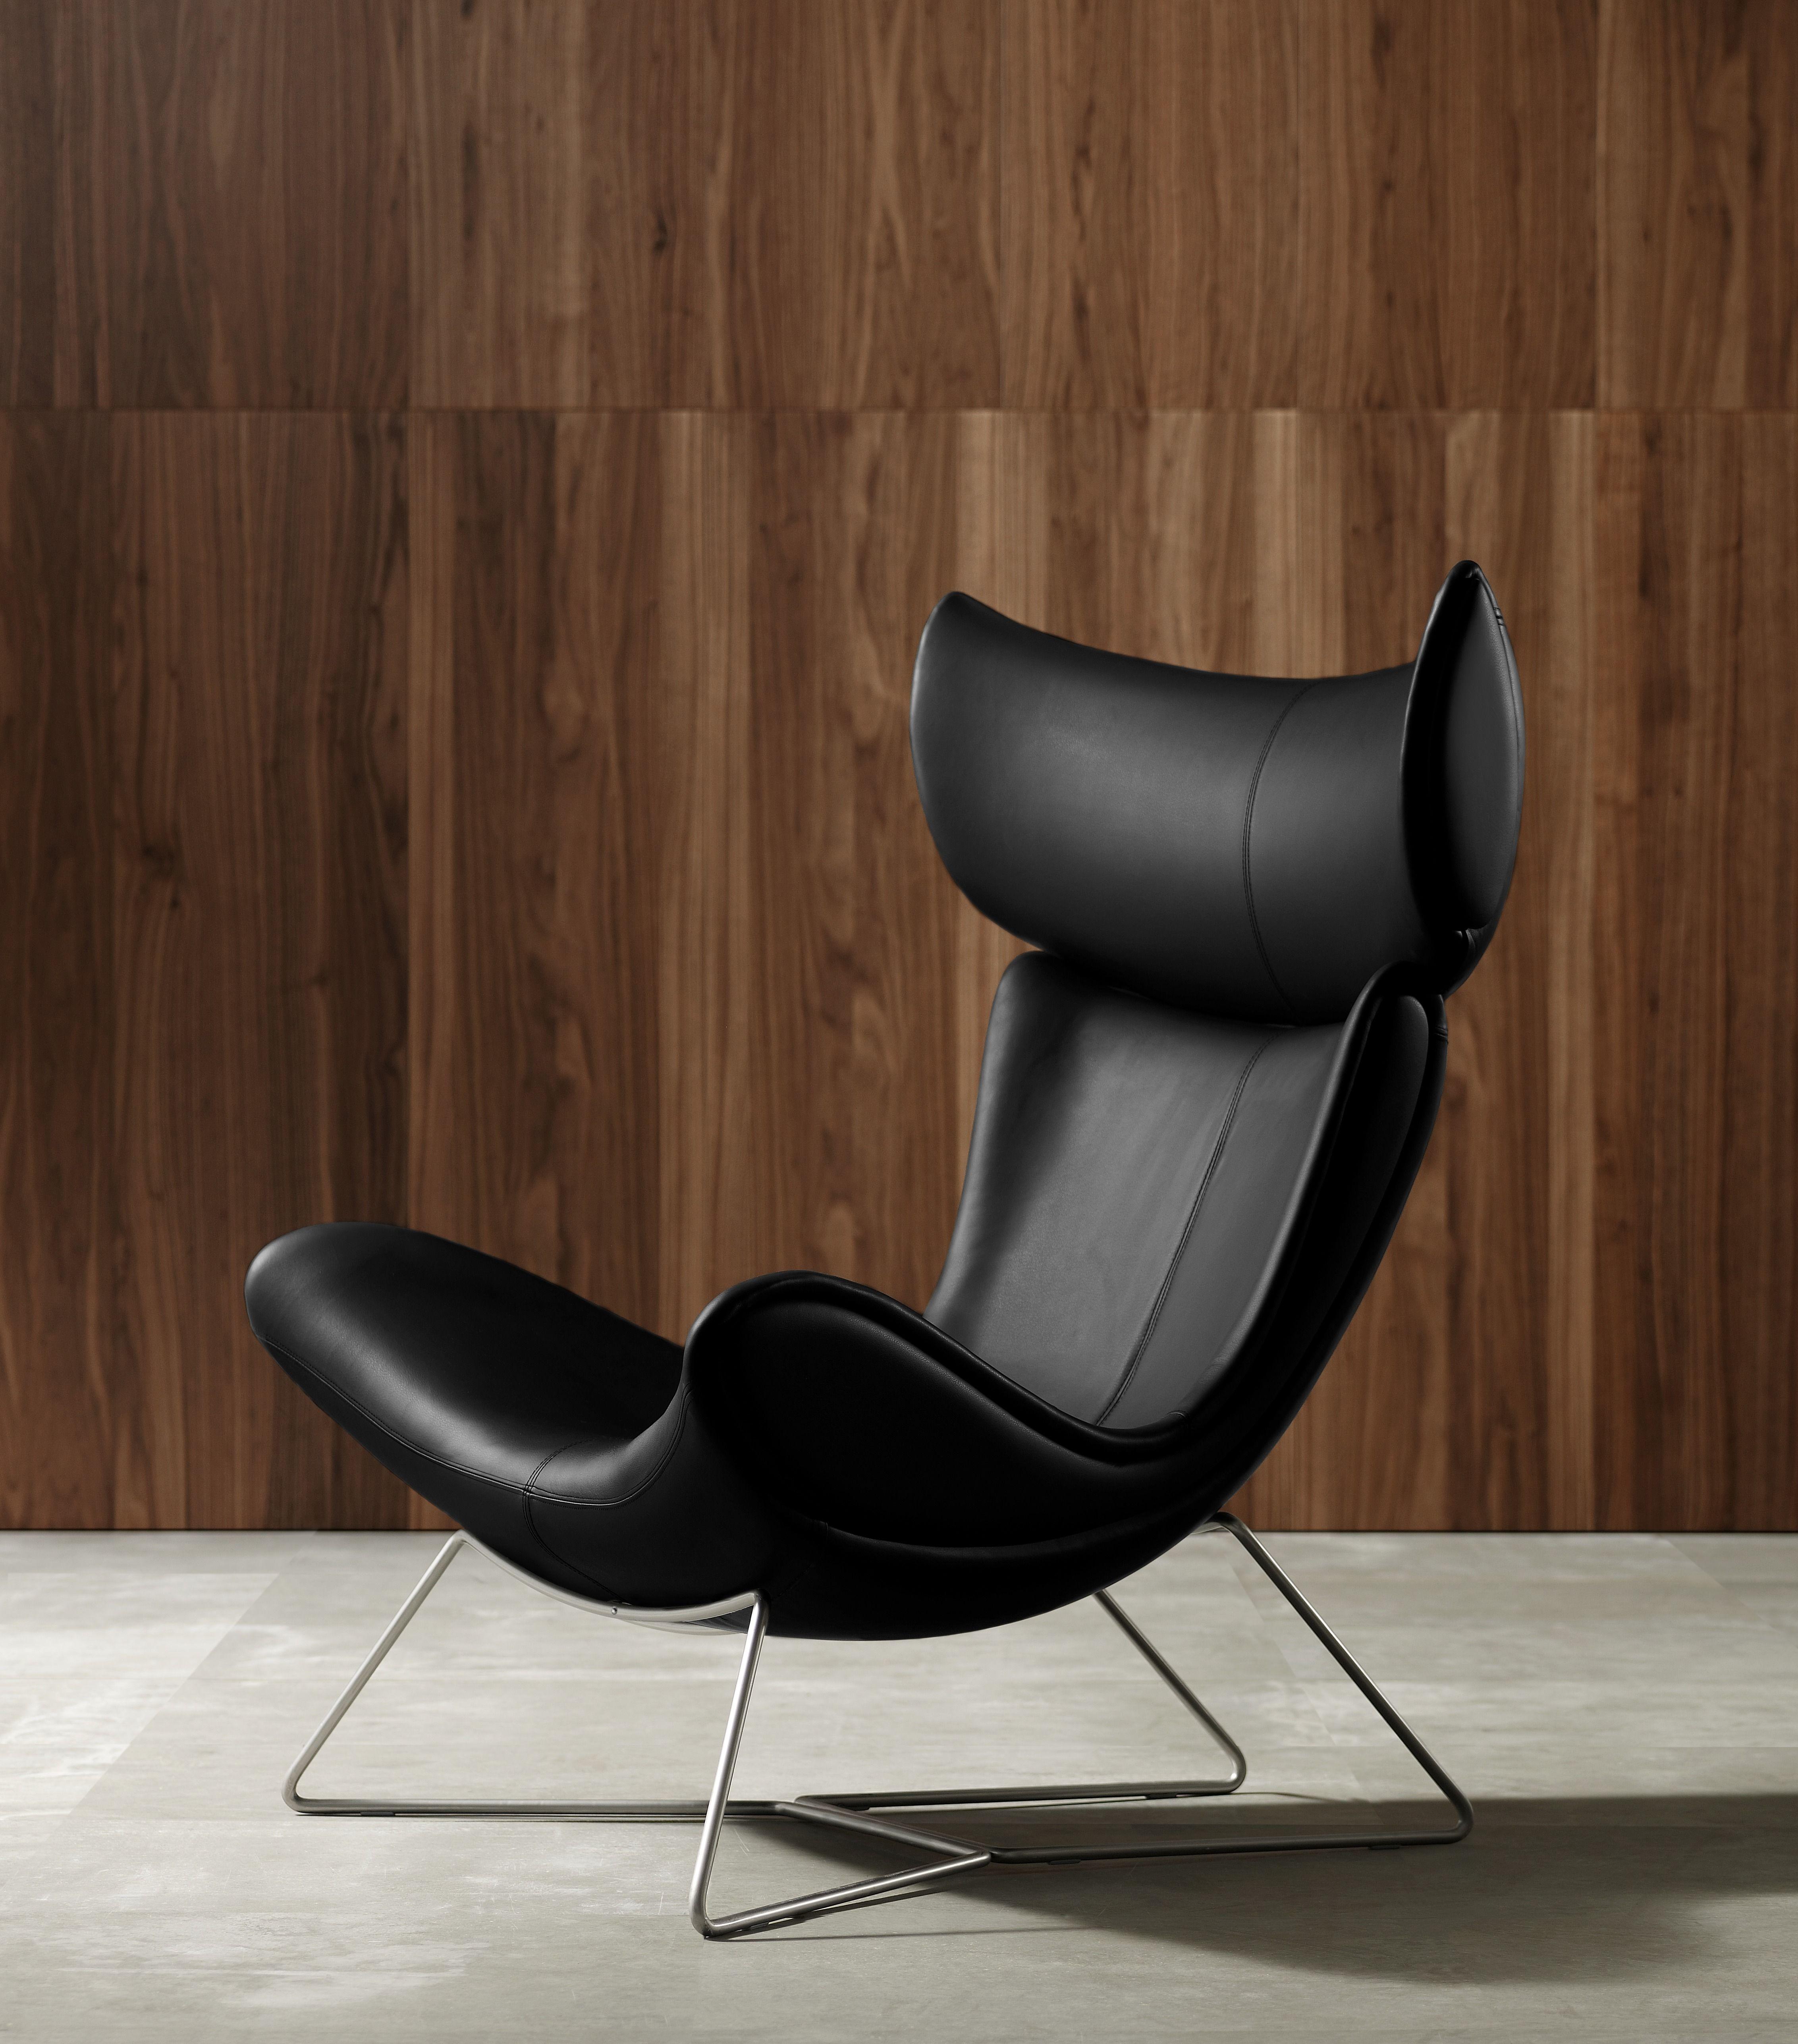 Imola Sessel von BoConcept boconcept scandinaviandesign interiordesign interior homedecor ...